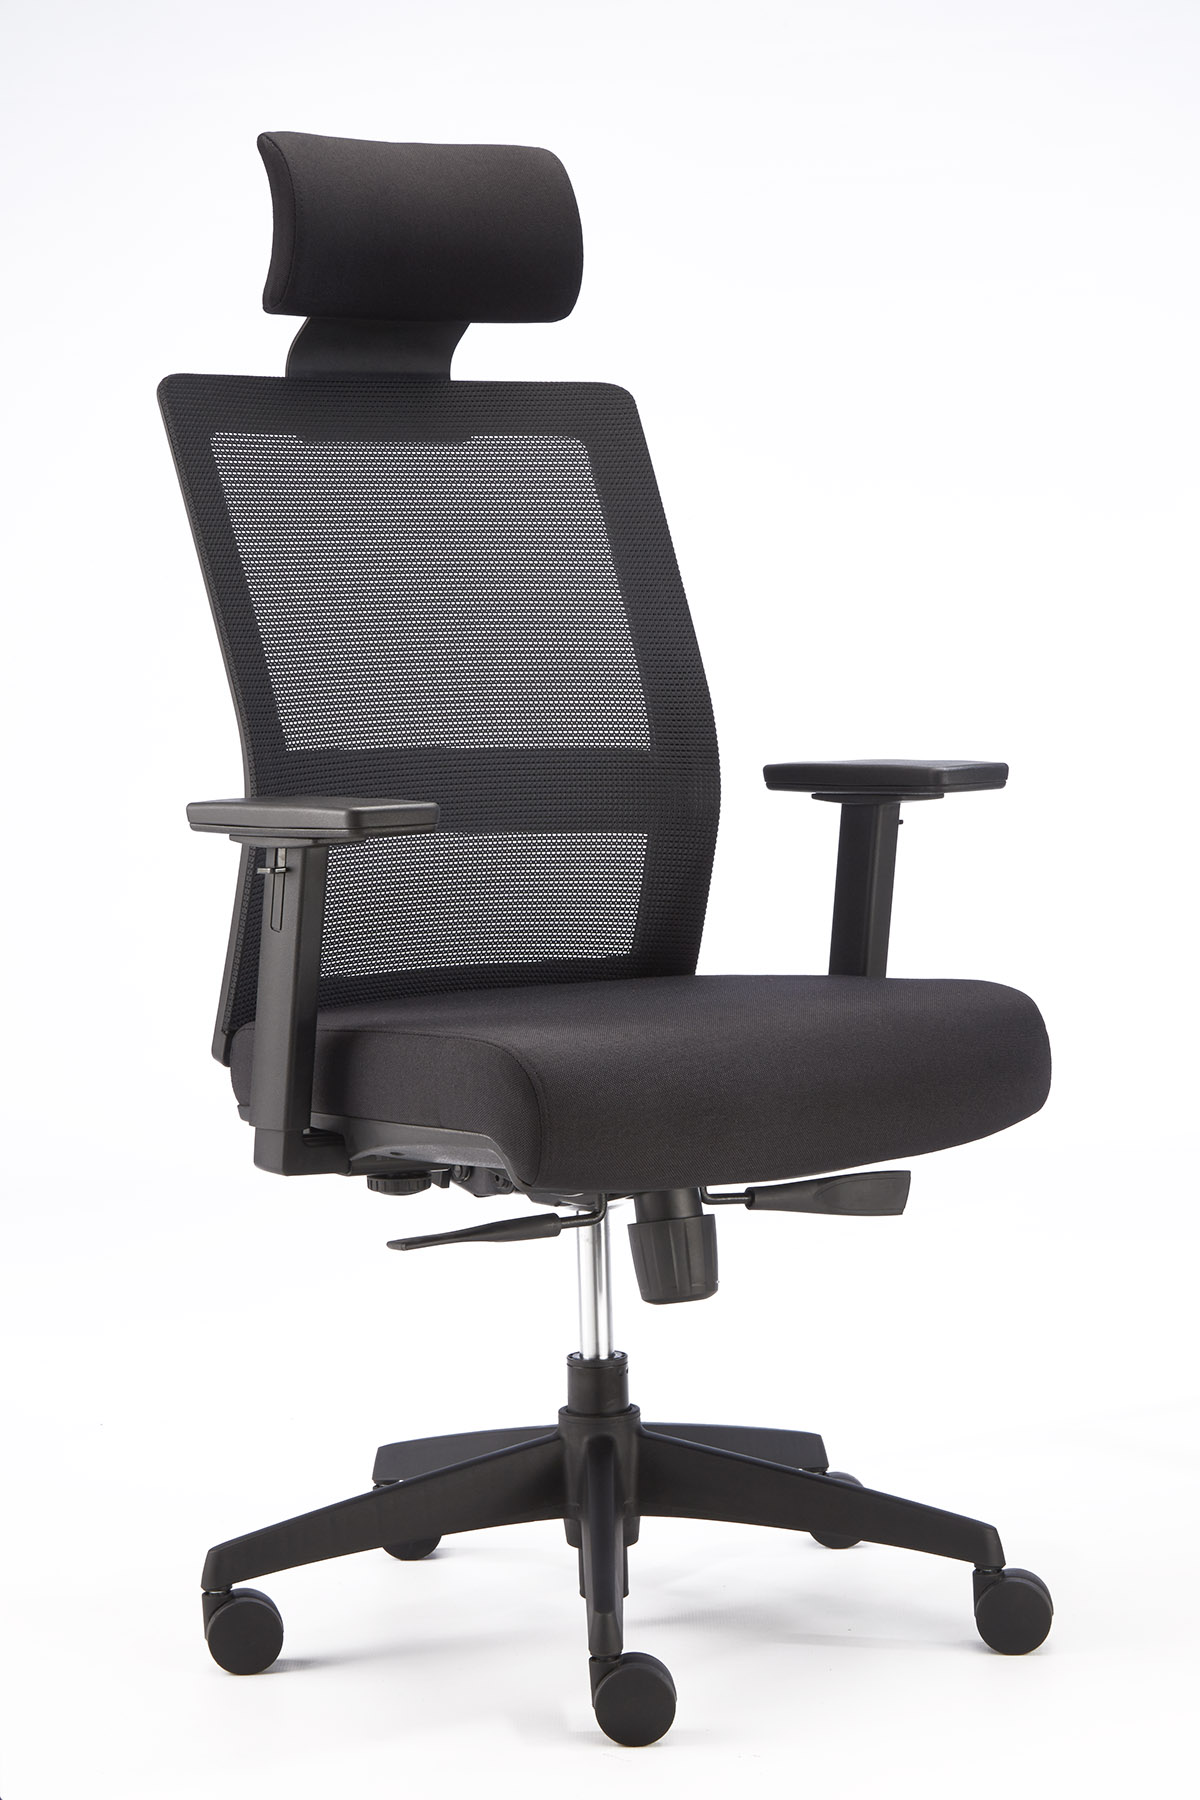 Fuse Executive with Headrest - Adjustabl